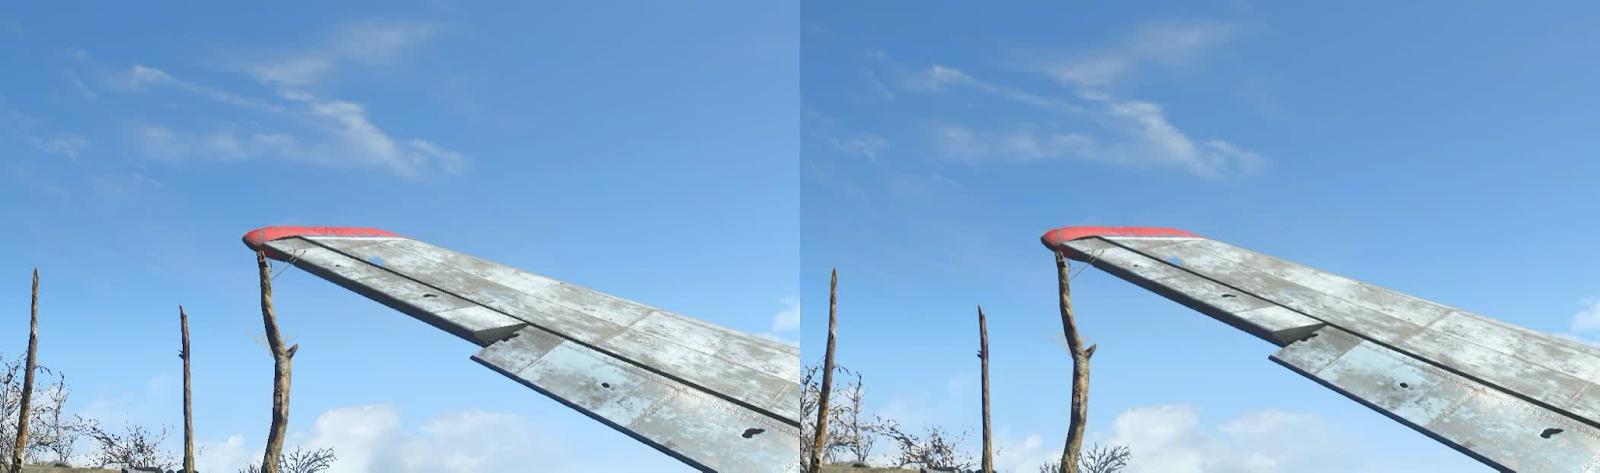 Без AA (слева) и TAA (справа)— обратите внимание на размытие деталей на крыле